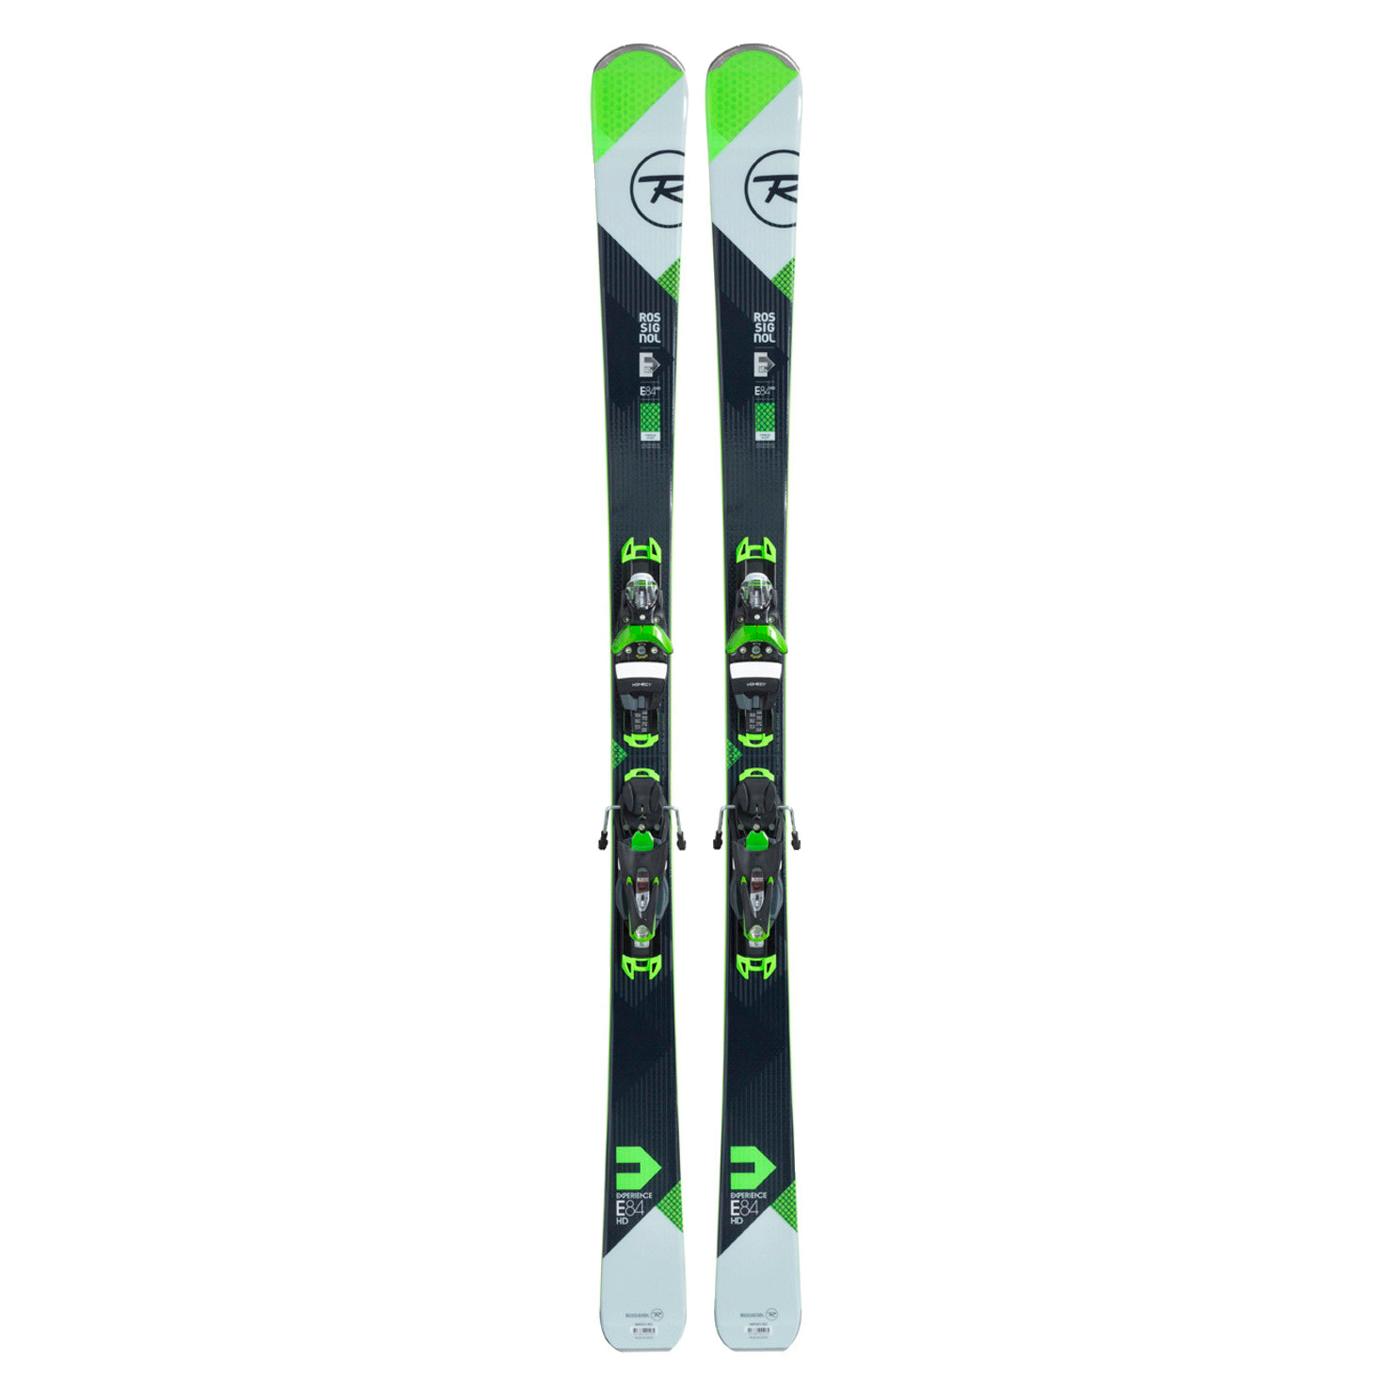 c521f35e966 Rossignol Experience 84 HD, All Mountain ski's, winter 2016/2017, NX 12  Konect bindingen